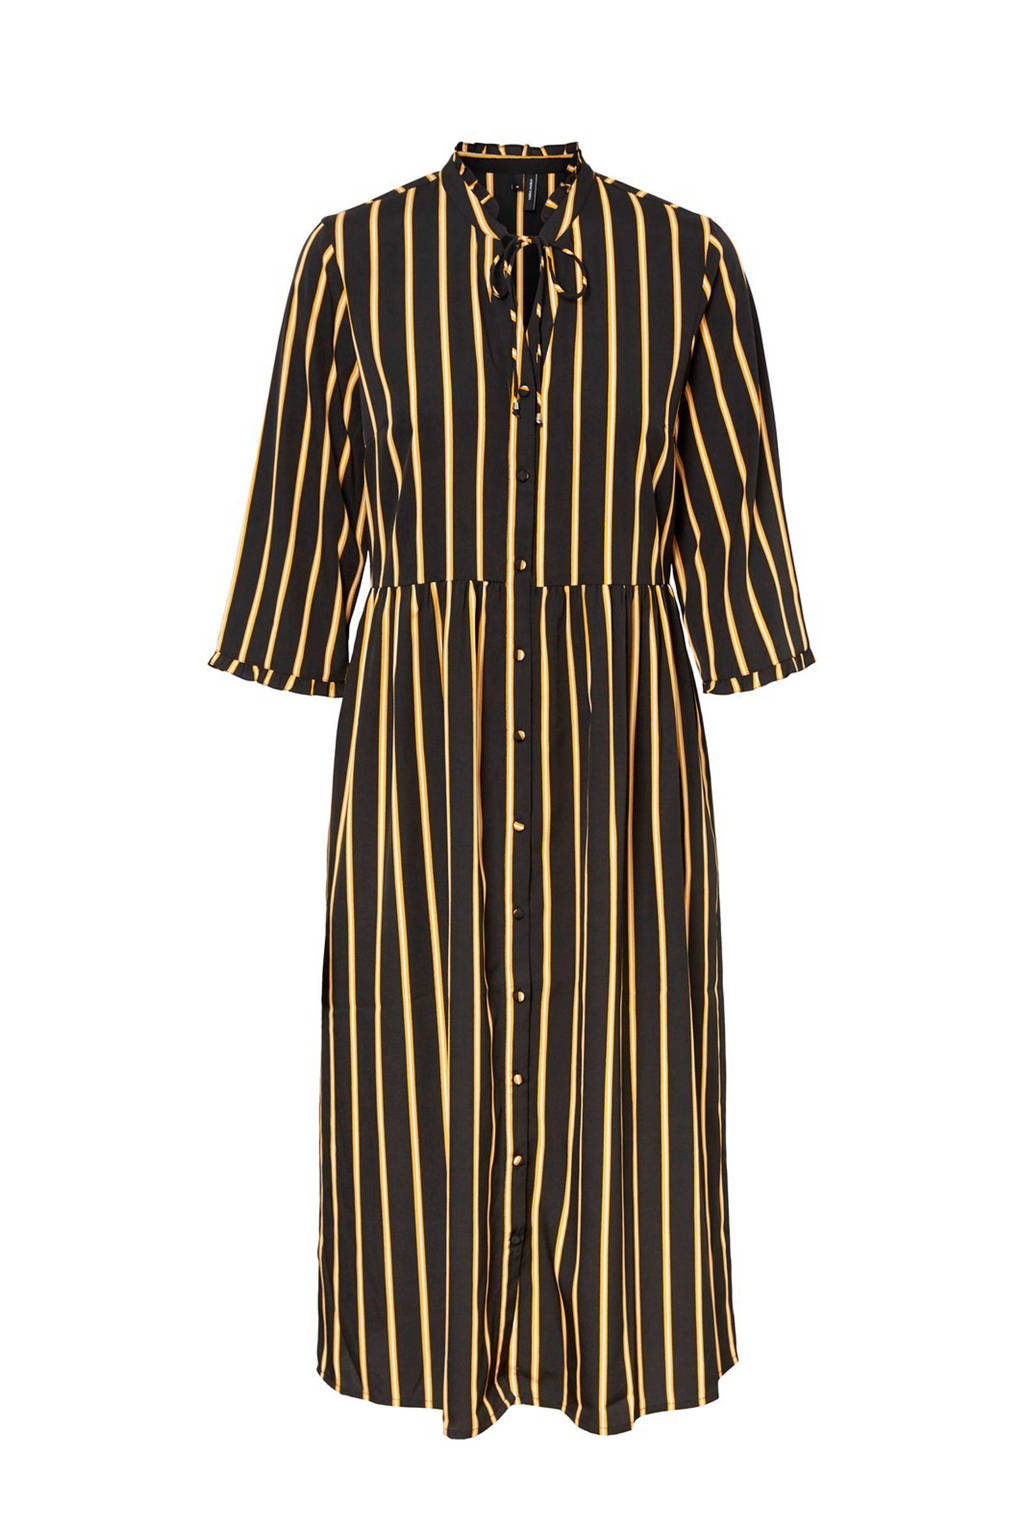 VERO MODA gestreepte blousejurk lang, Zwart/geel